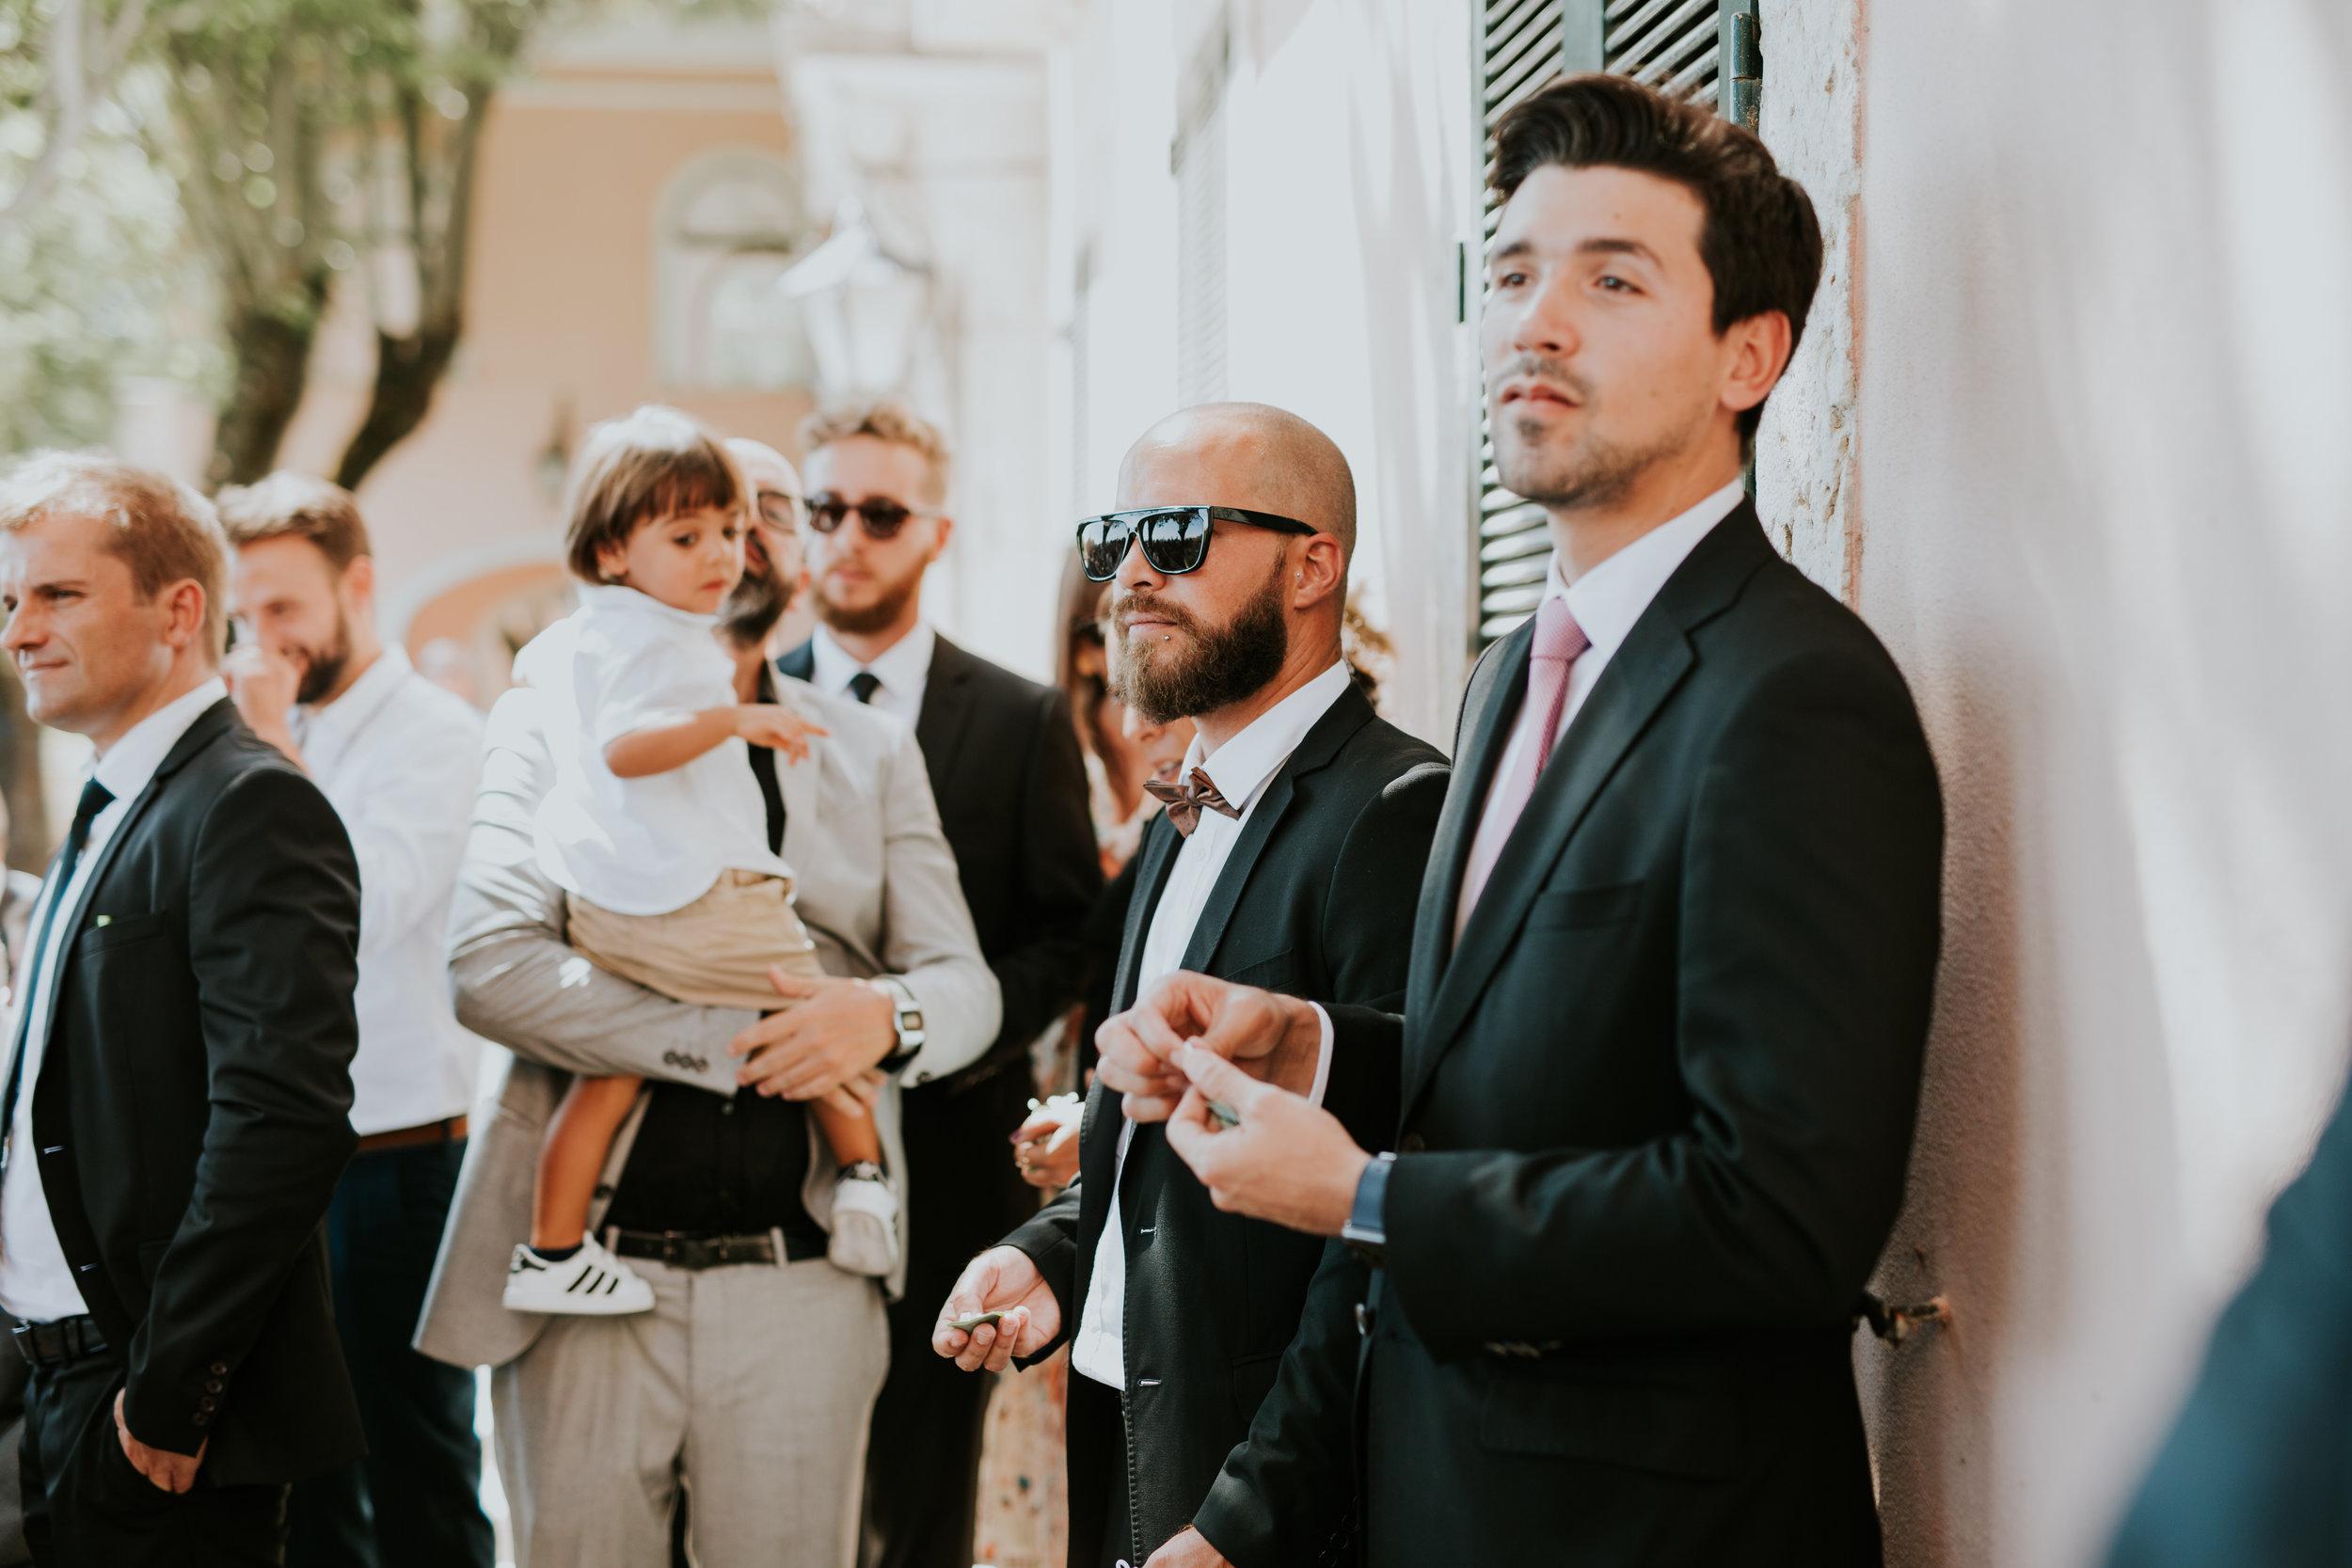 J&P 285_ 02 setembro 2017 Wedding day_.jpg